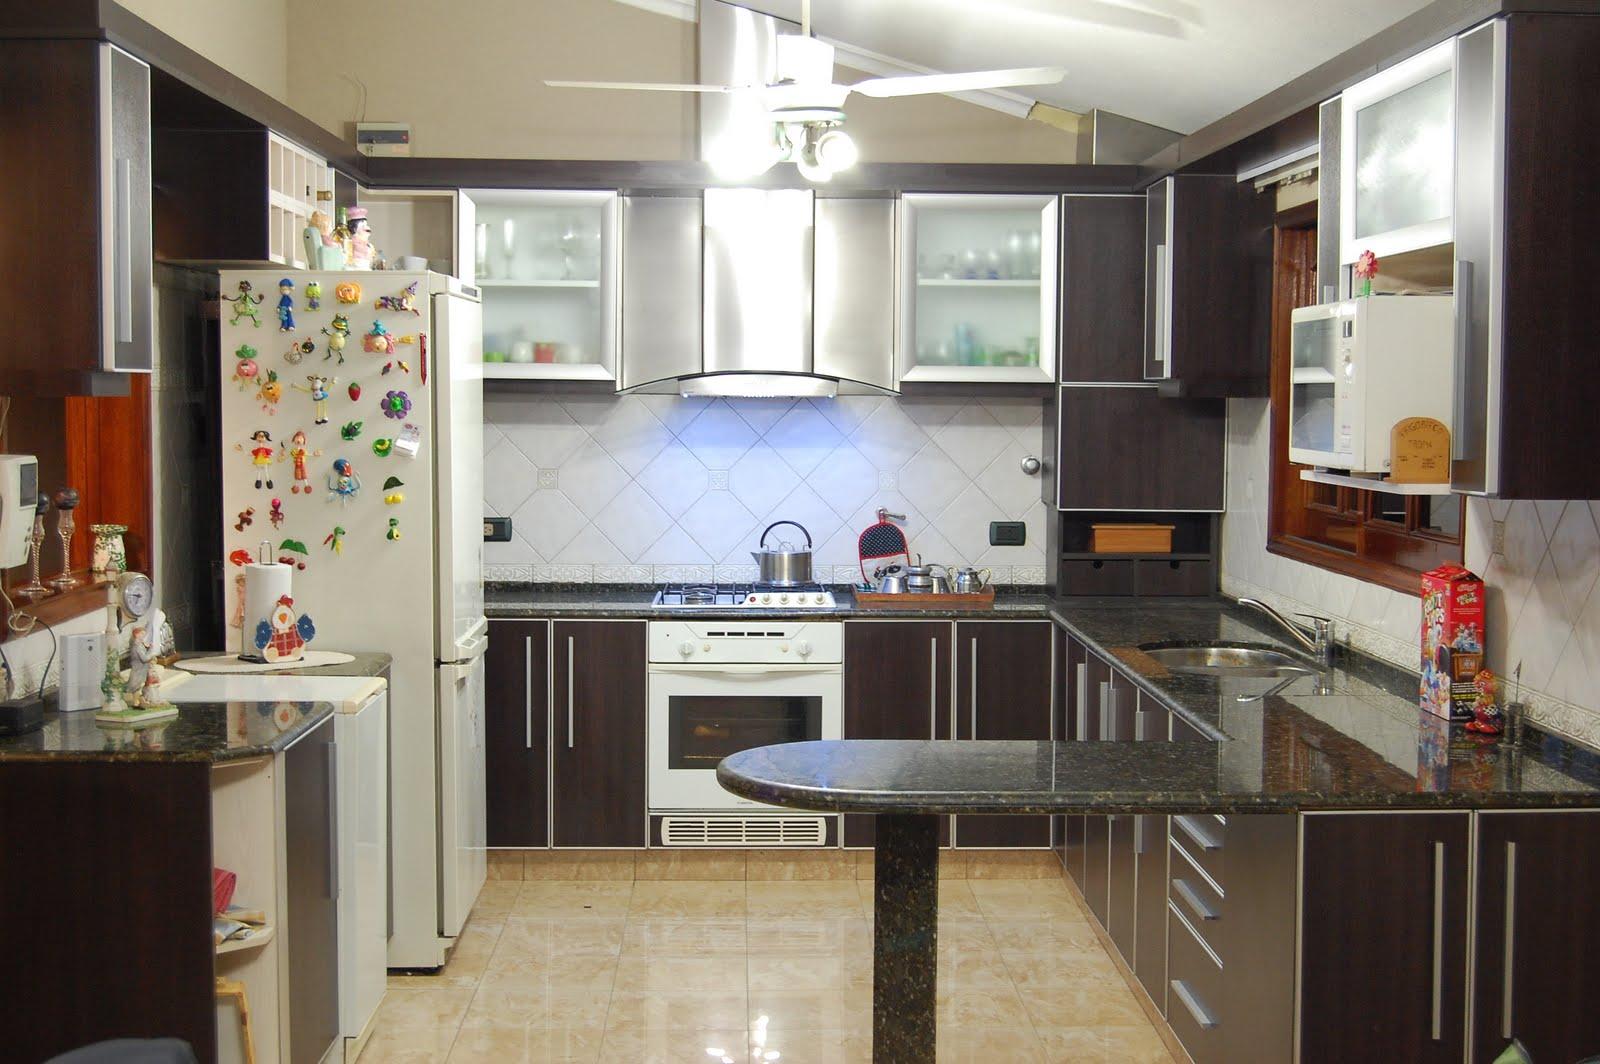 Fotos de muebles de cocina de roble - Cocina roble ...